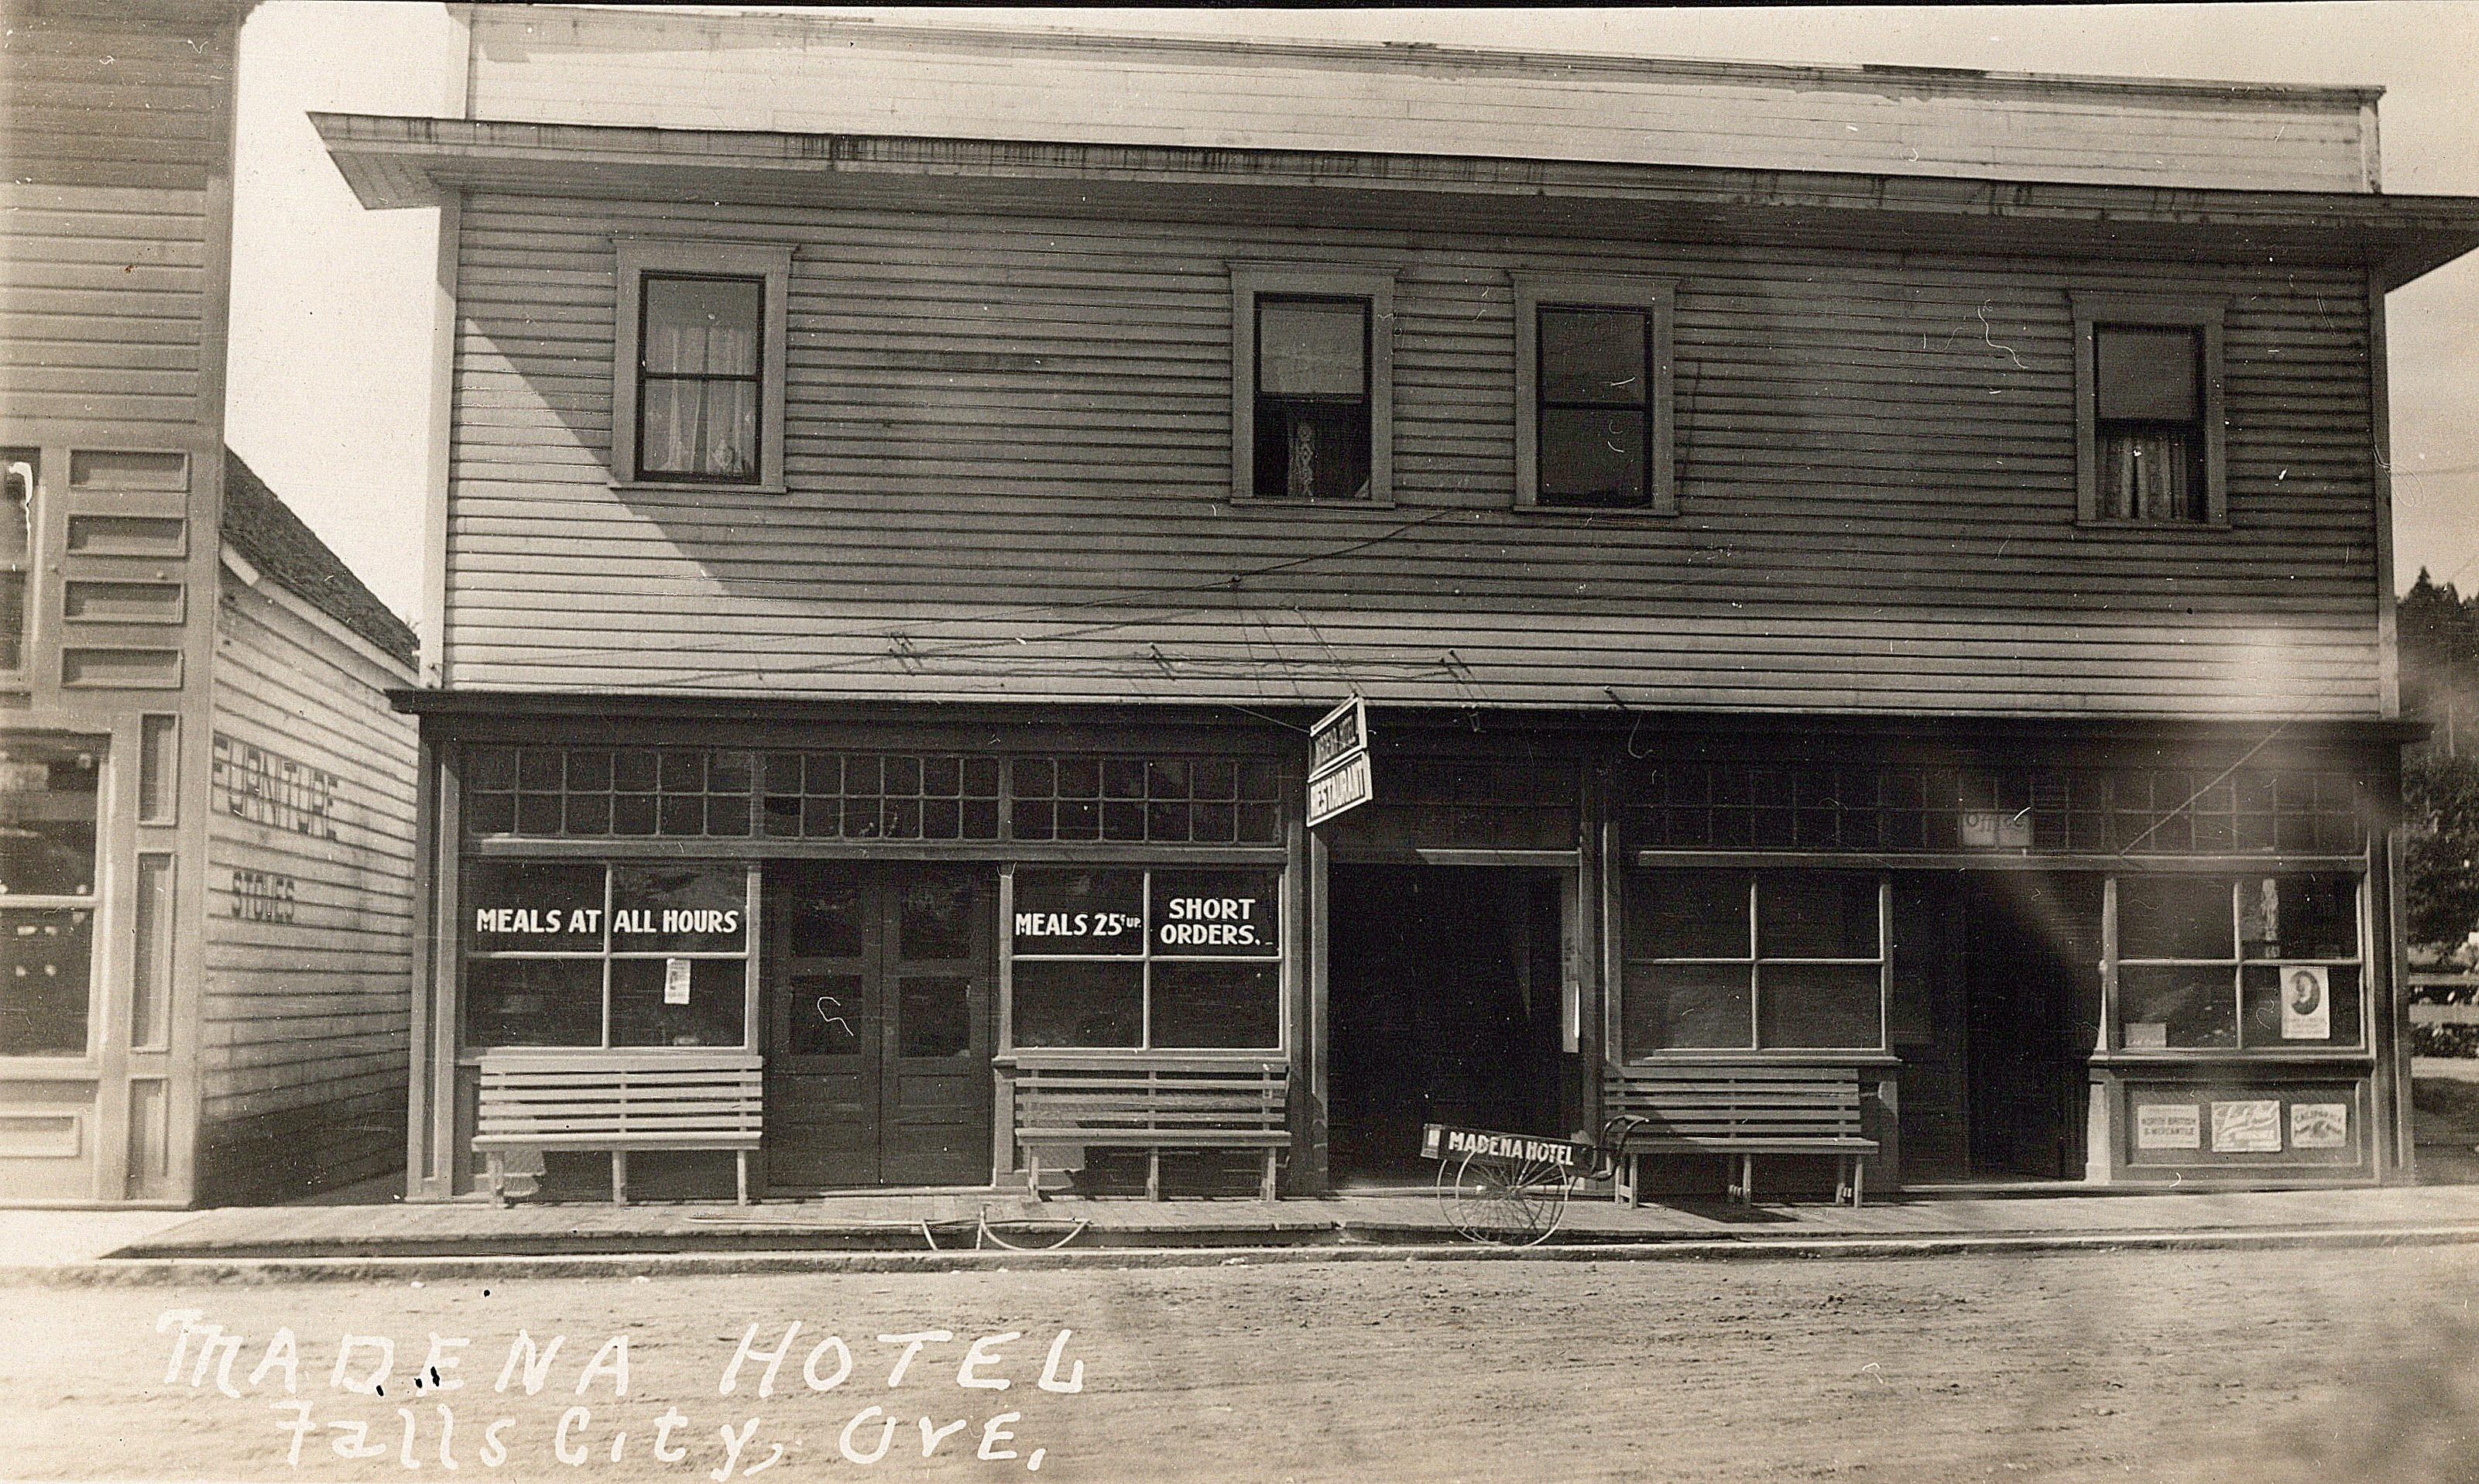 1924_0050 front.jpg